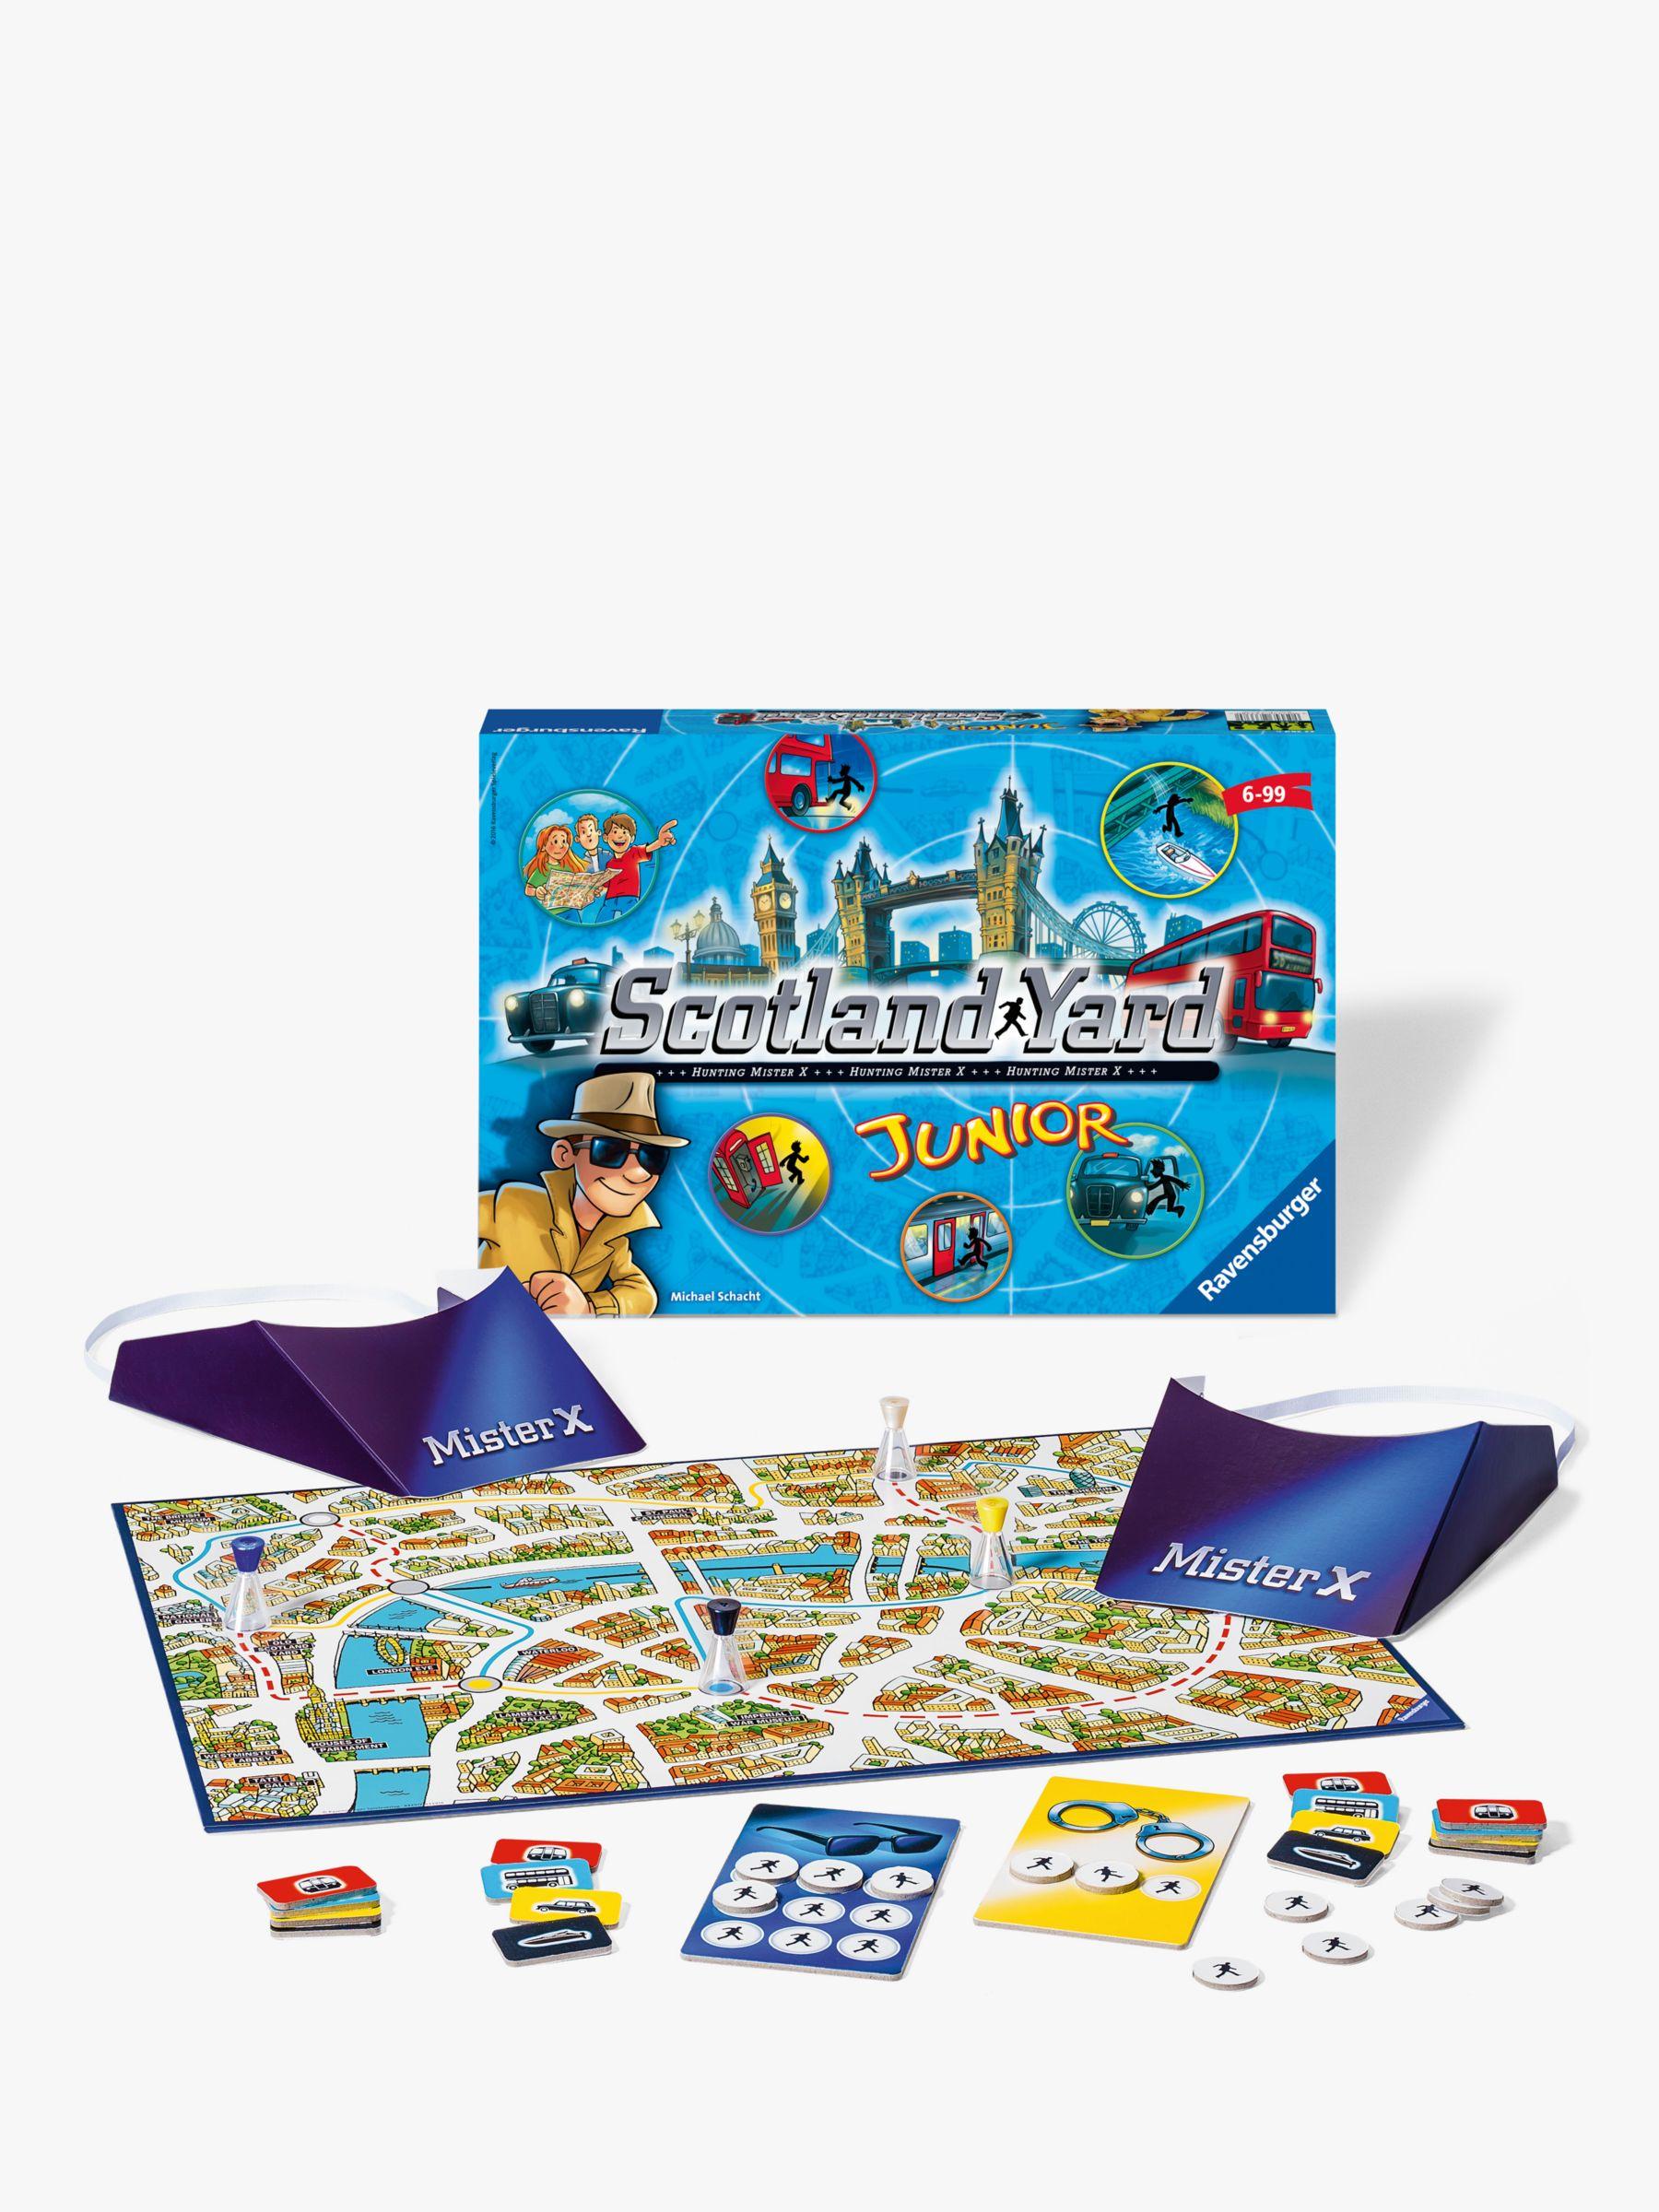 Ravensburger Ravensburger Scotland Yard Junior Board Game